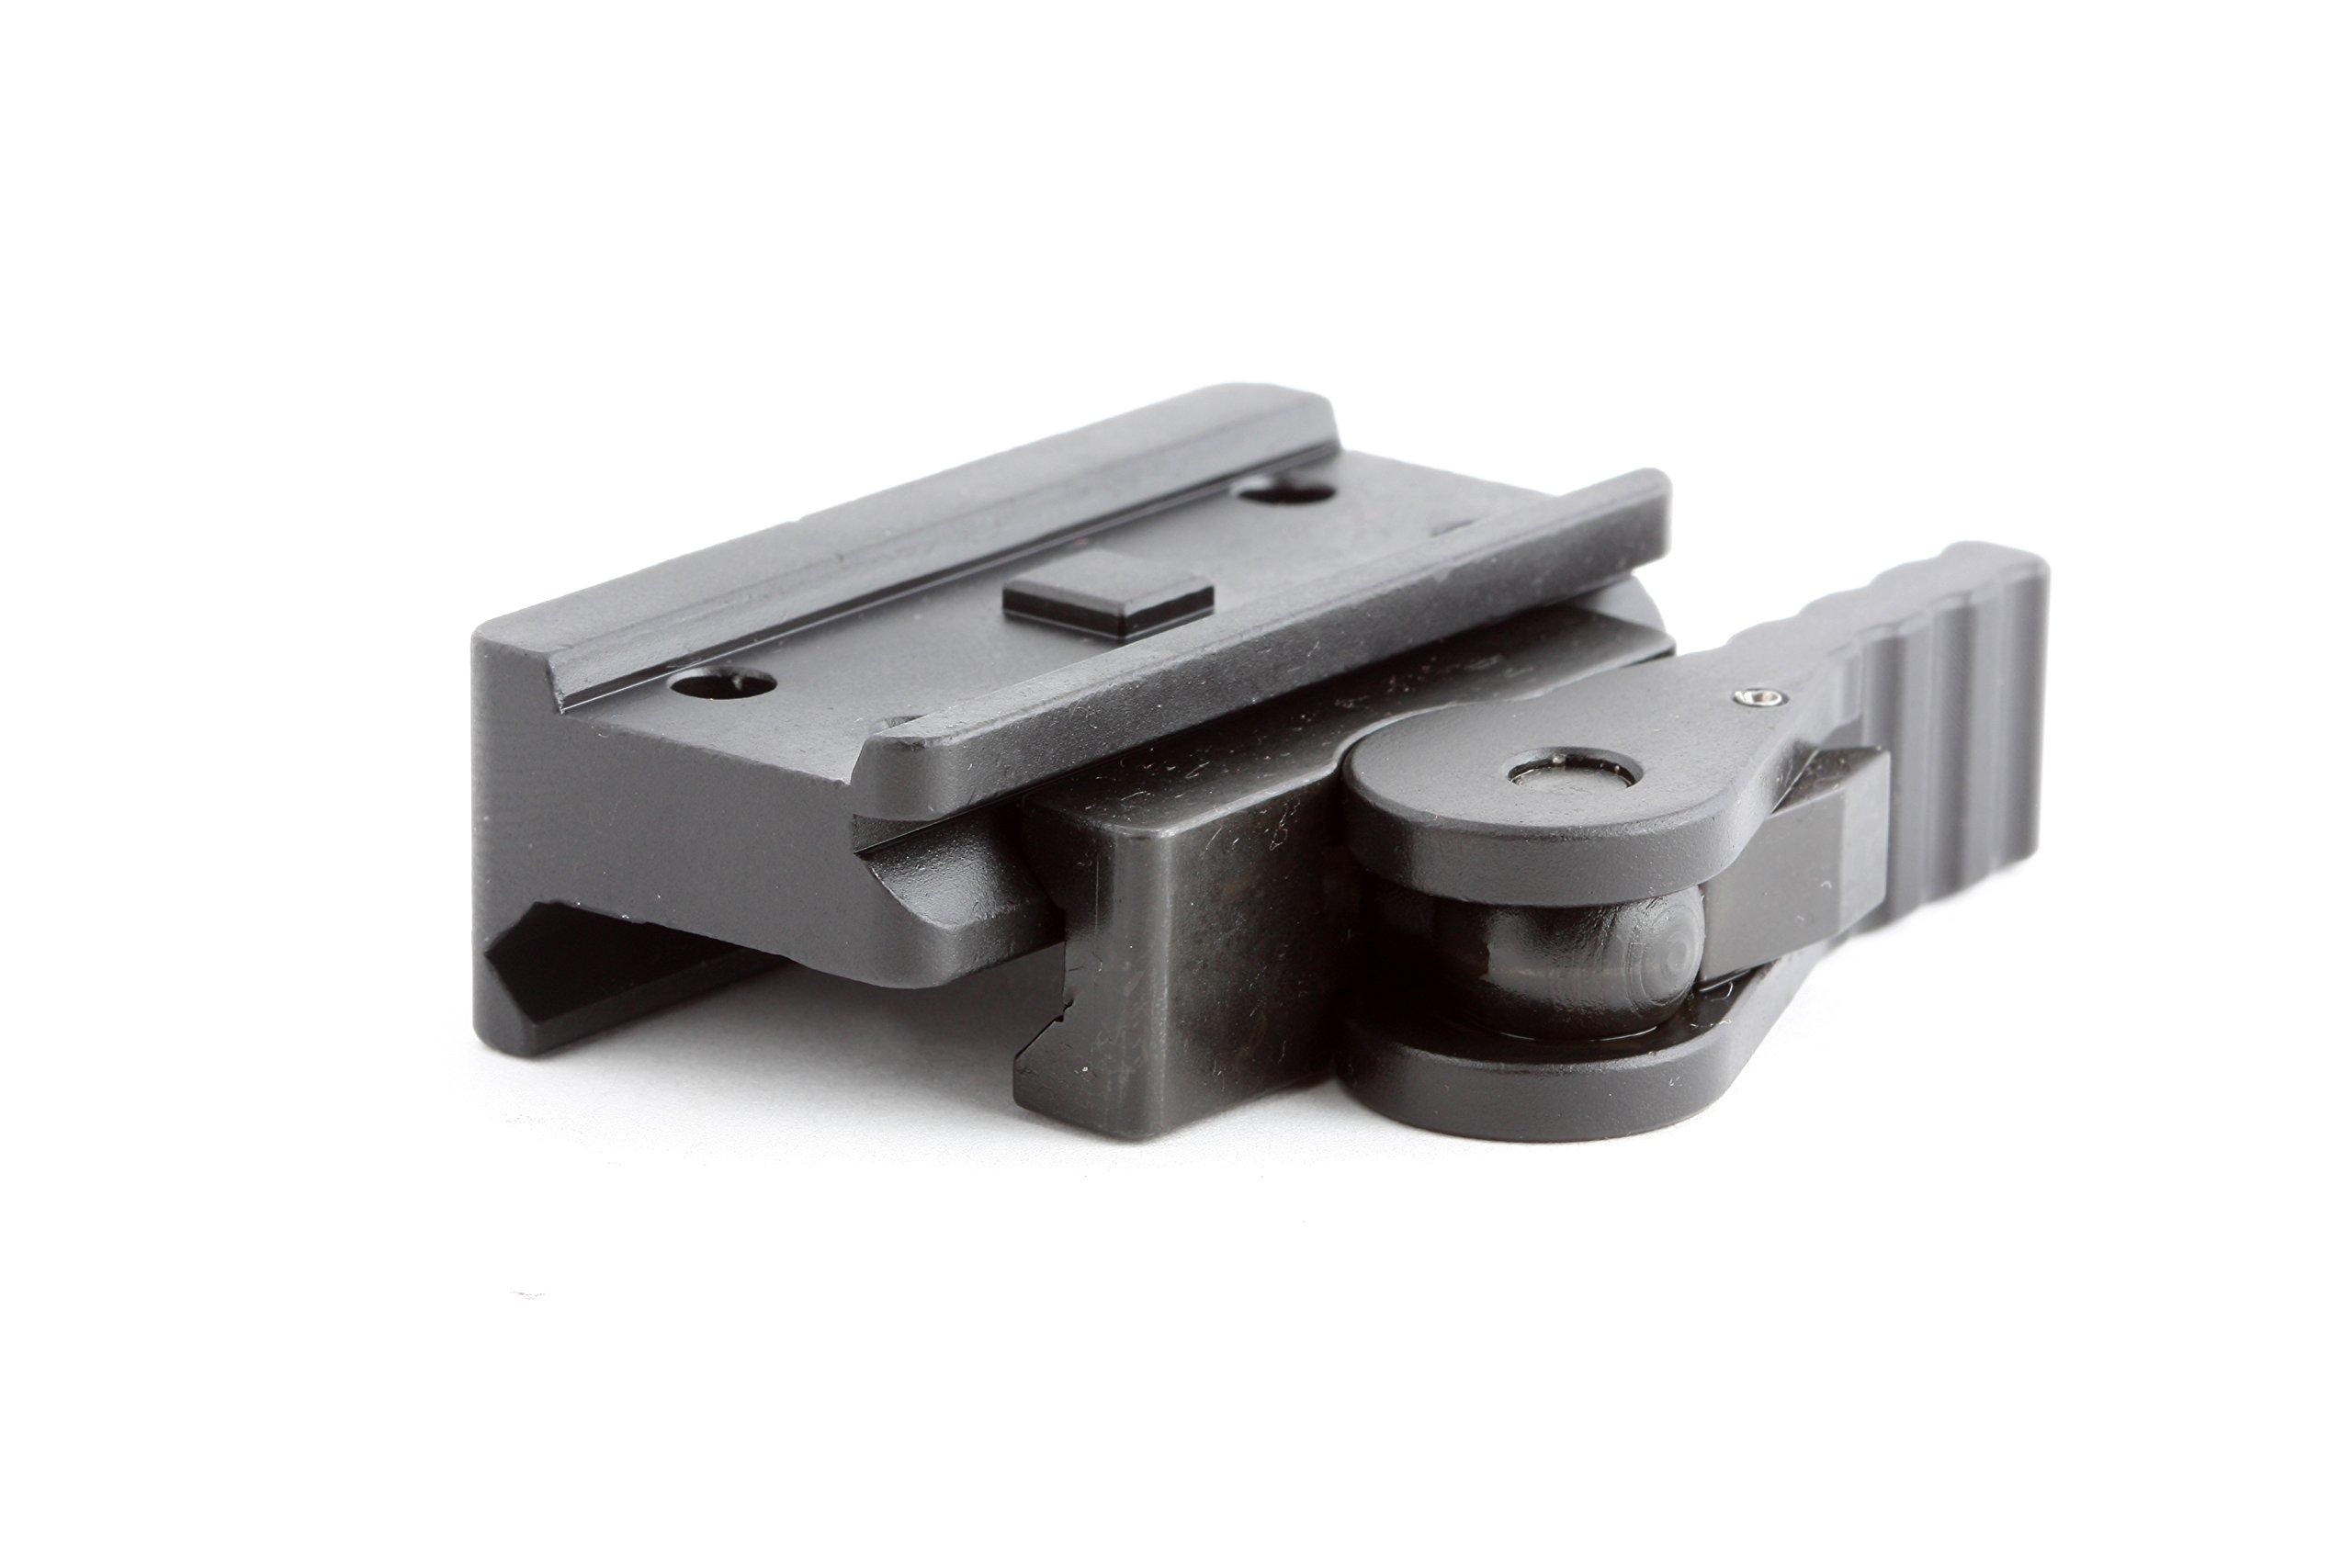 American Defense AD-T1-L STD Riflescope Optic Mount, Black by American Defense Mfg.